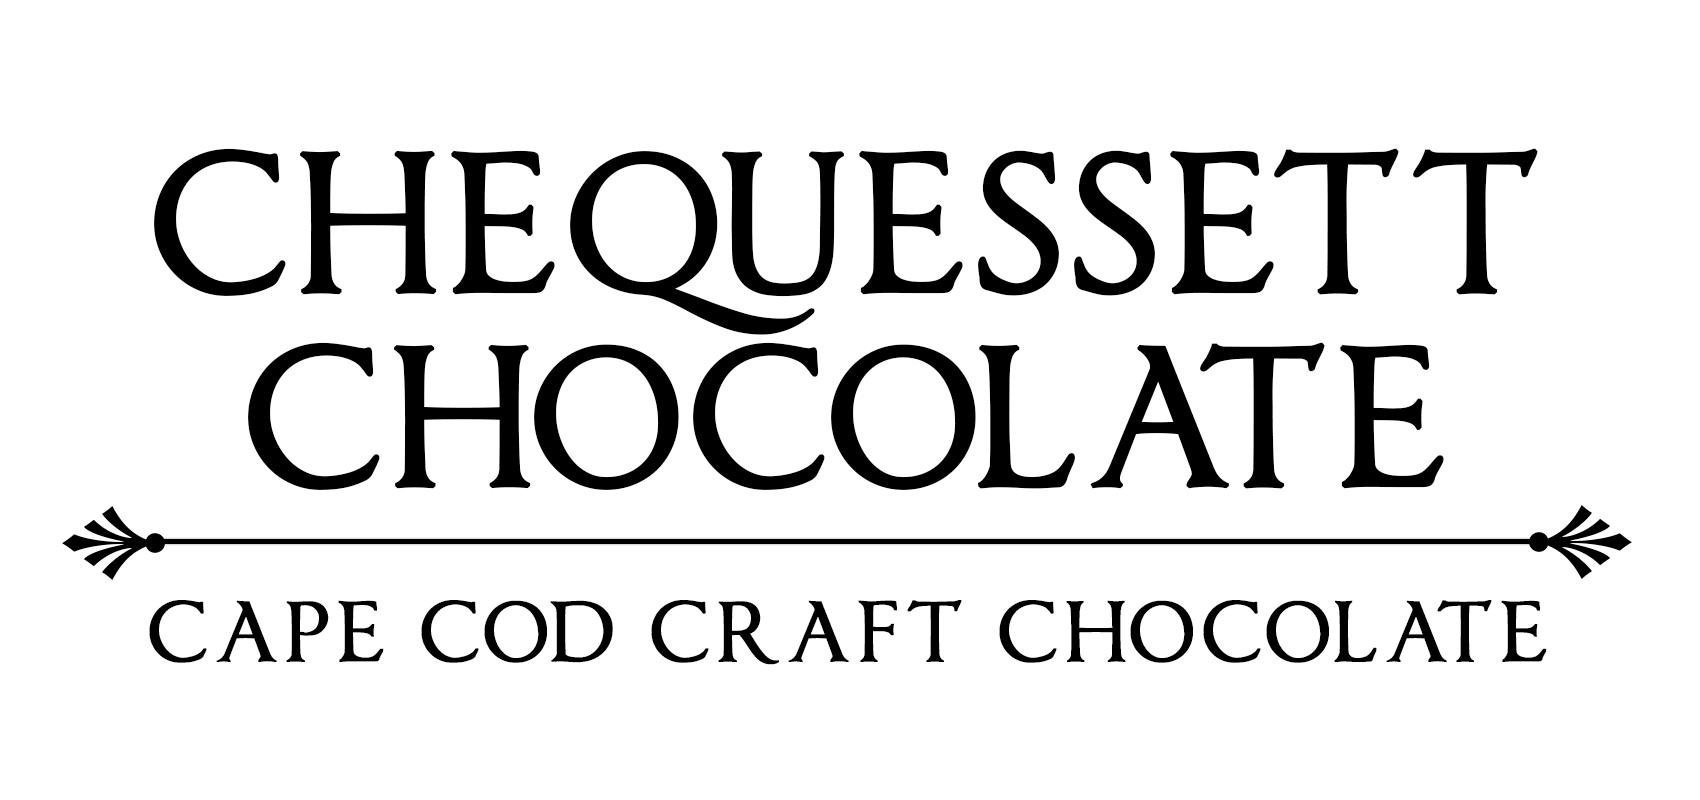 Shop Chequessett Chocolate